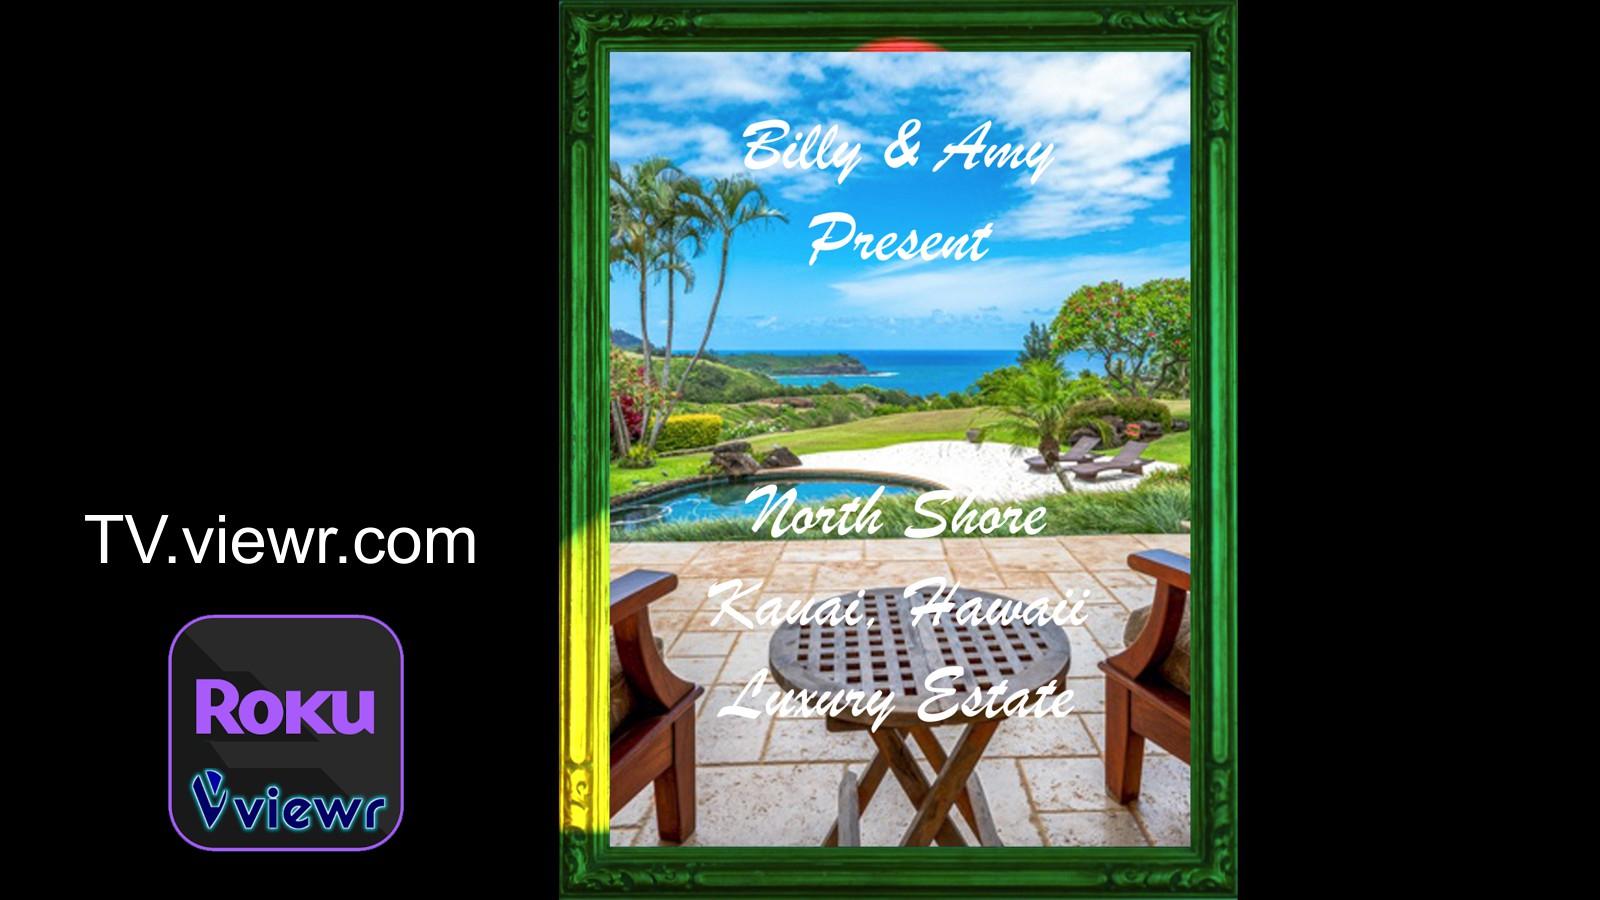 Billy and Amy Present North Shore Kauai Hawaii Luxury Estate viewr TV Slide